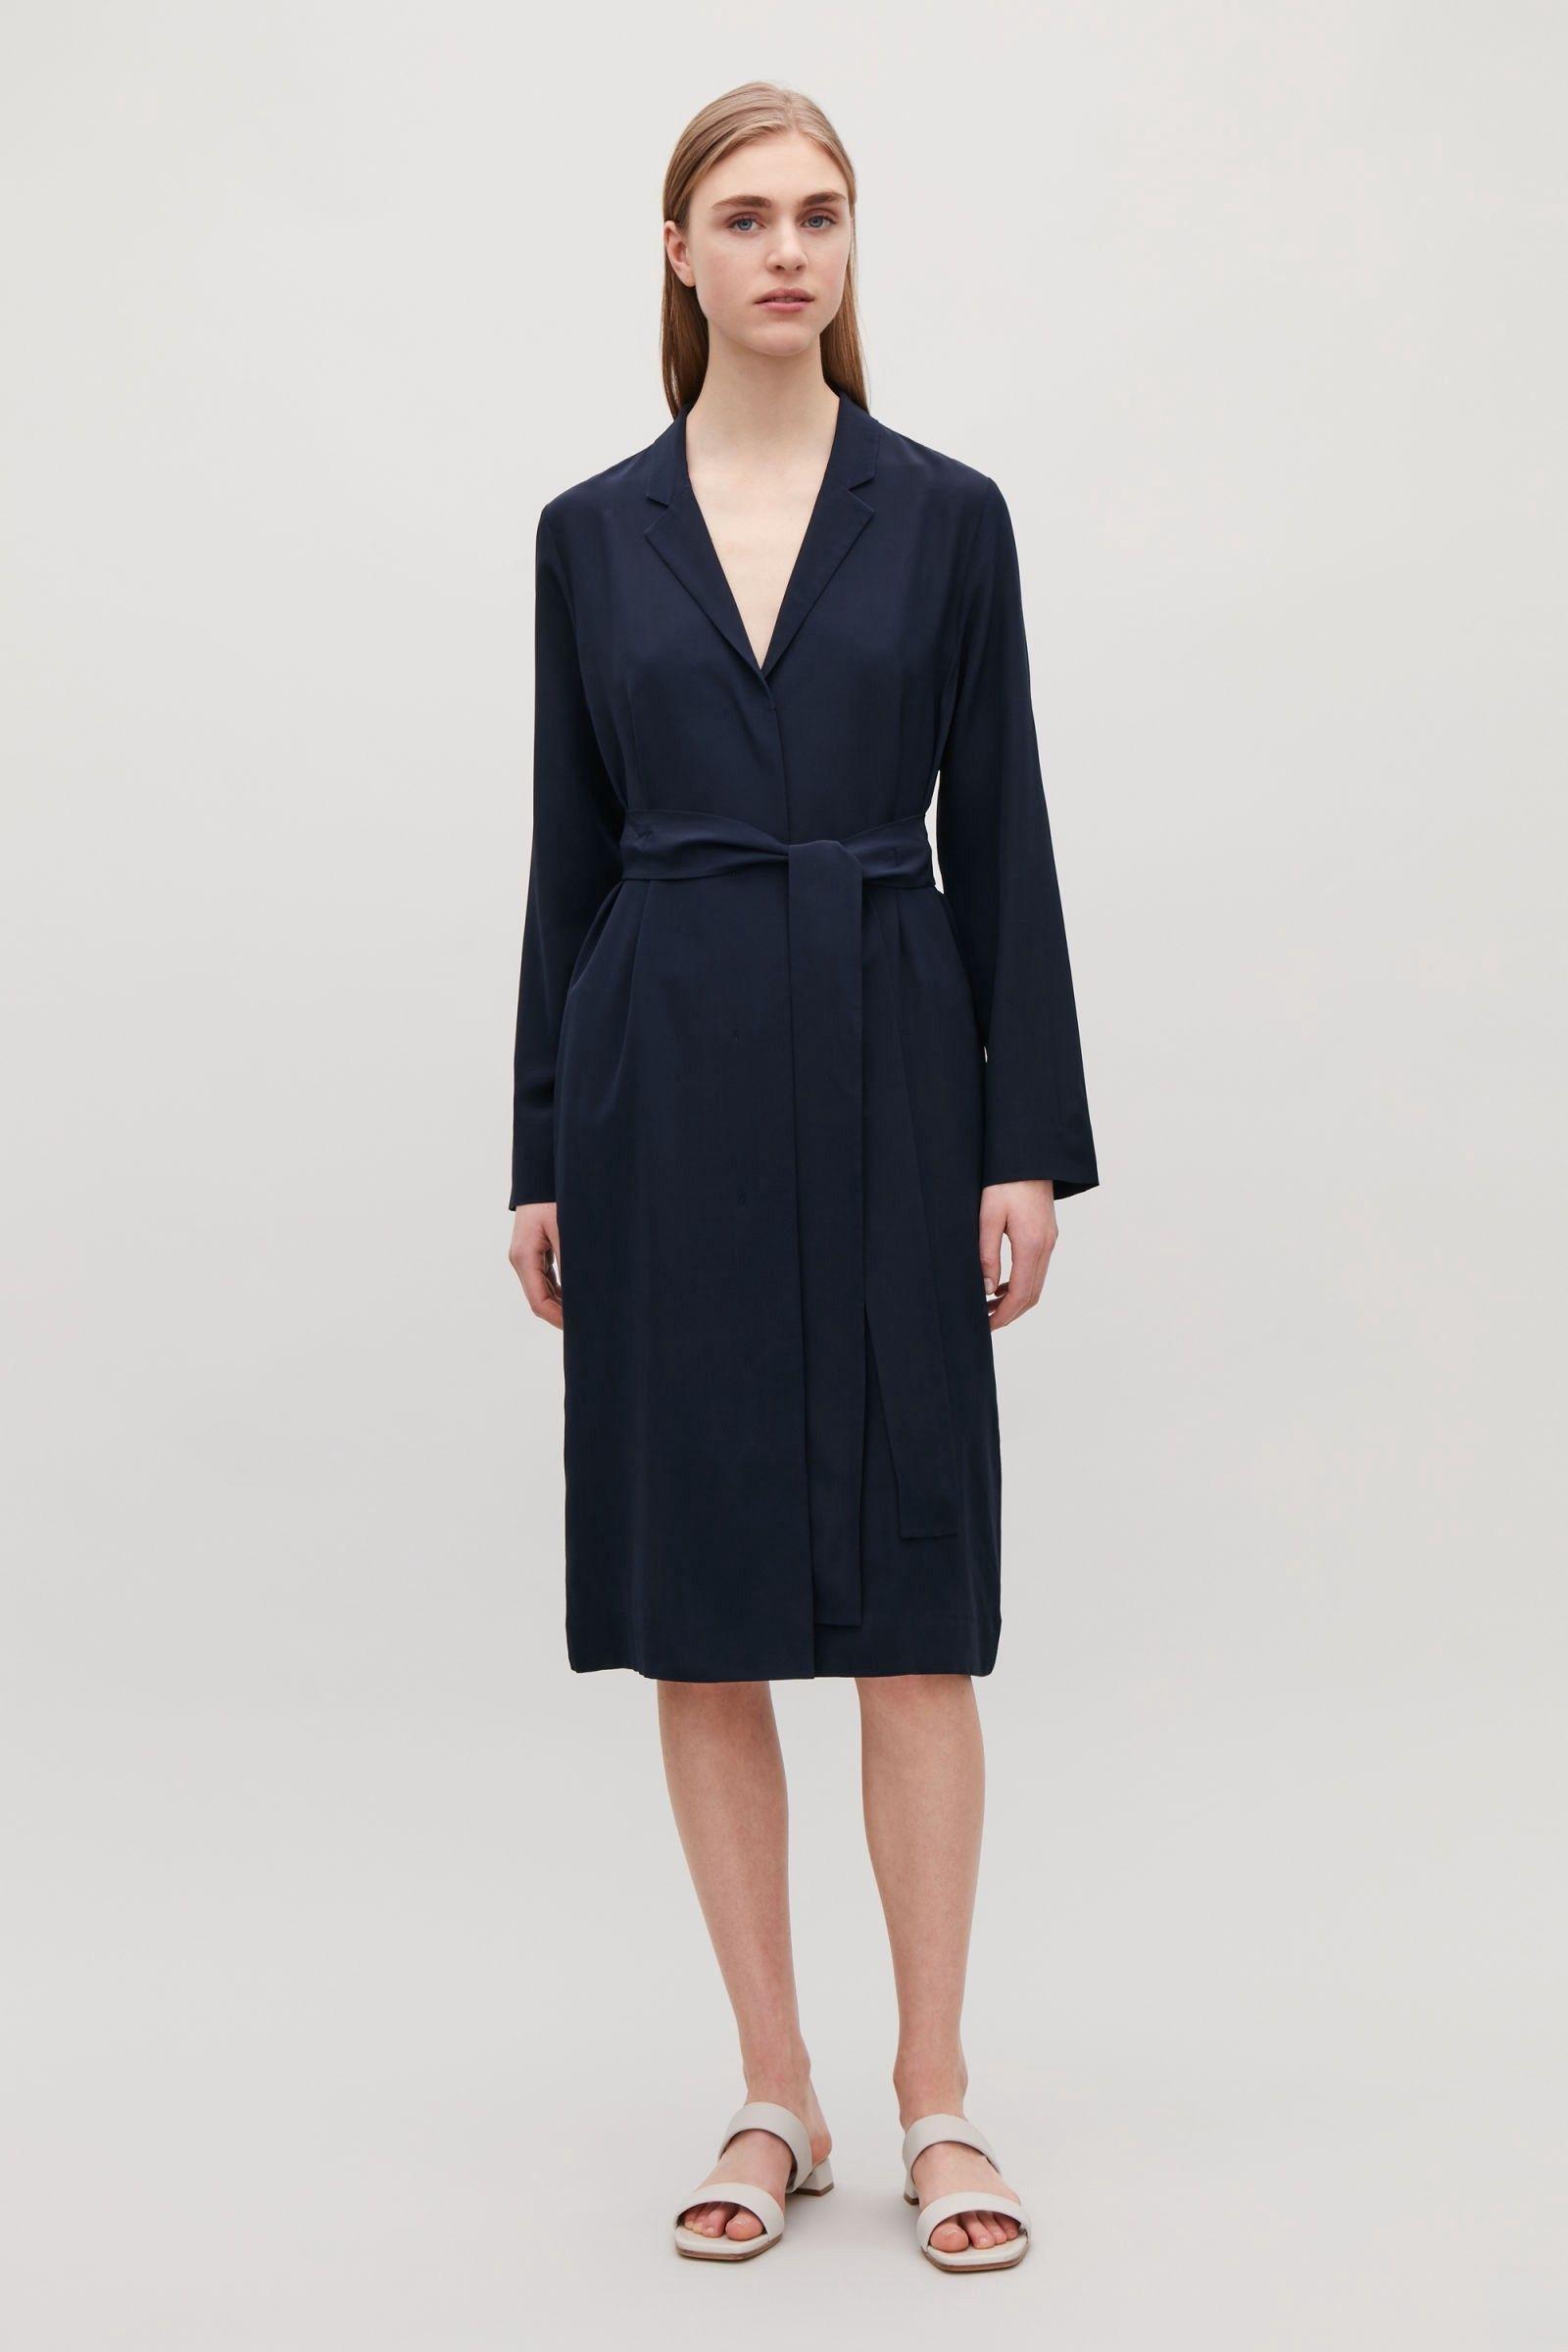 cc47b4ad54e63 Cos Silk Shirt Dress - Steel Blue 12